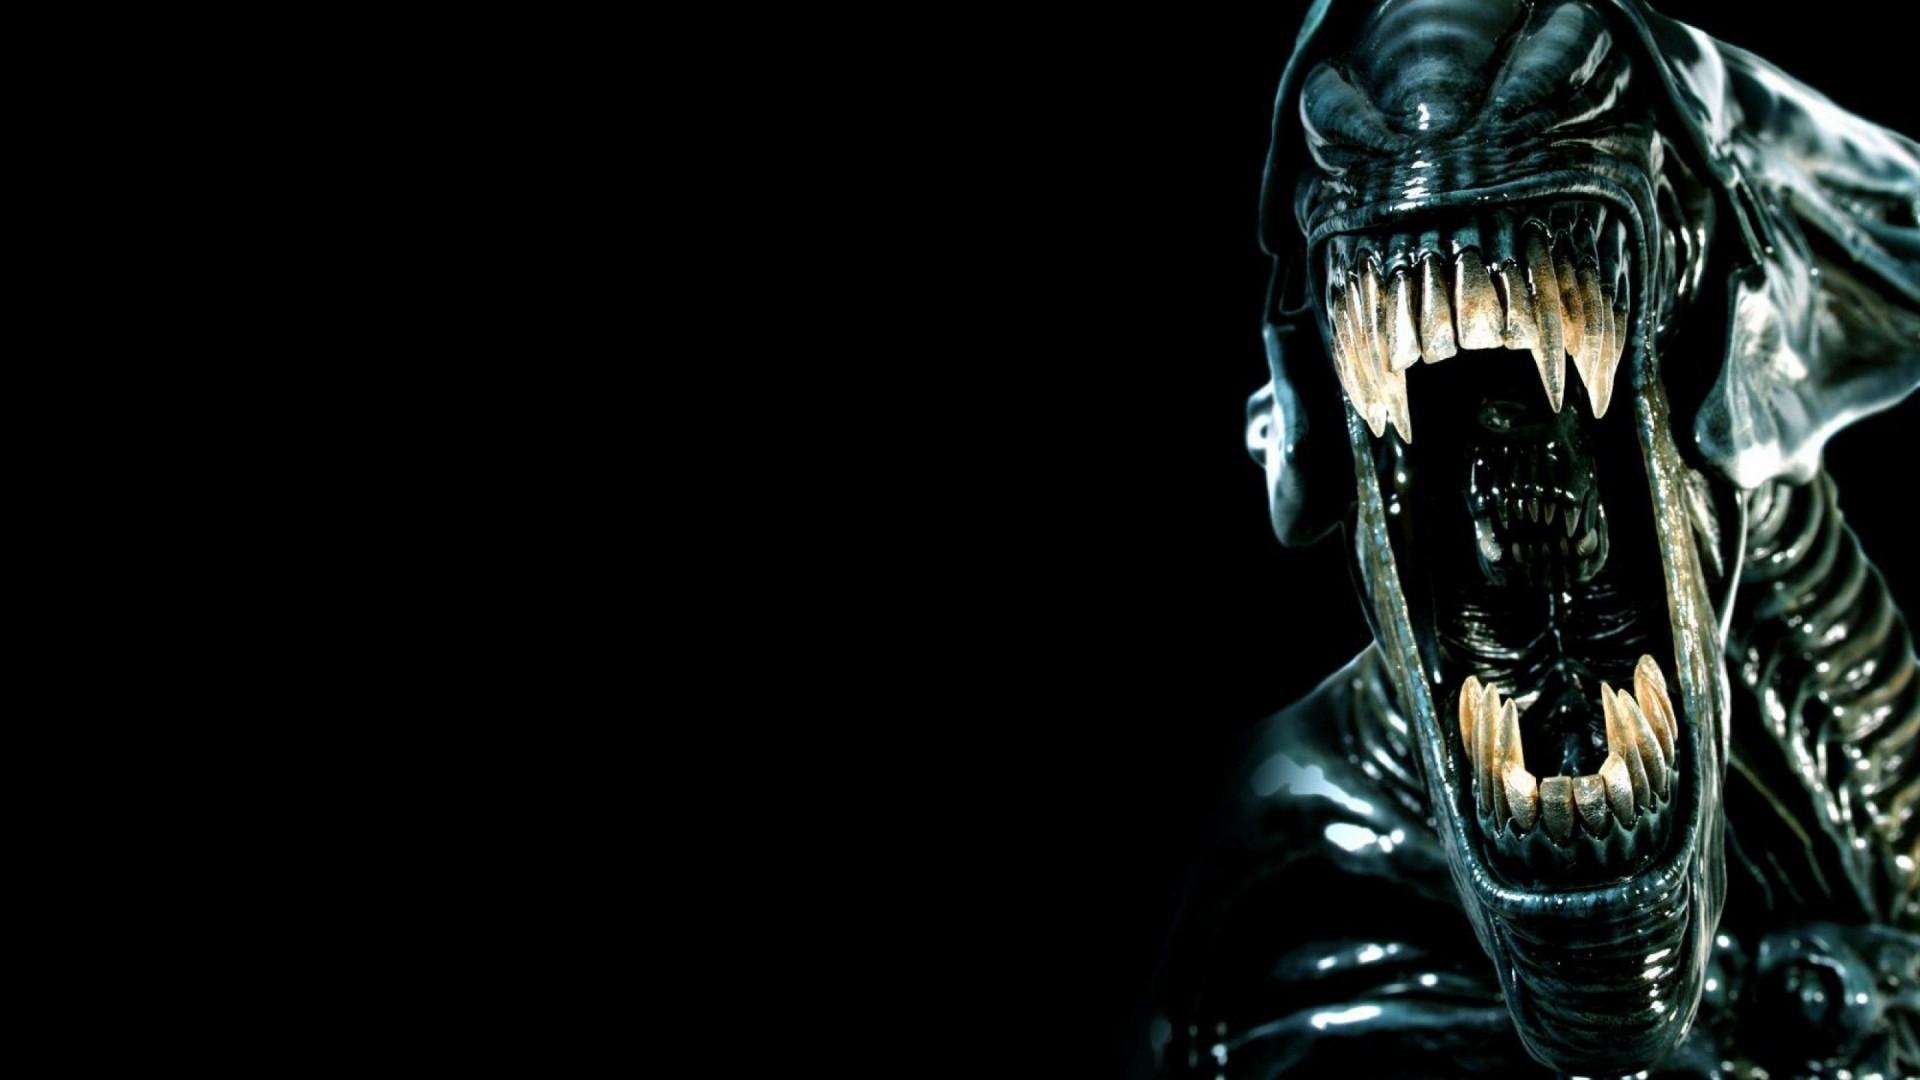 Res: 1920x1080, Download Wallpaper  alien, teeth, horror, fear, killer, evil Full  HD 1080p HD Background